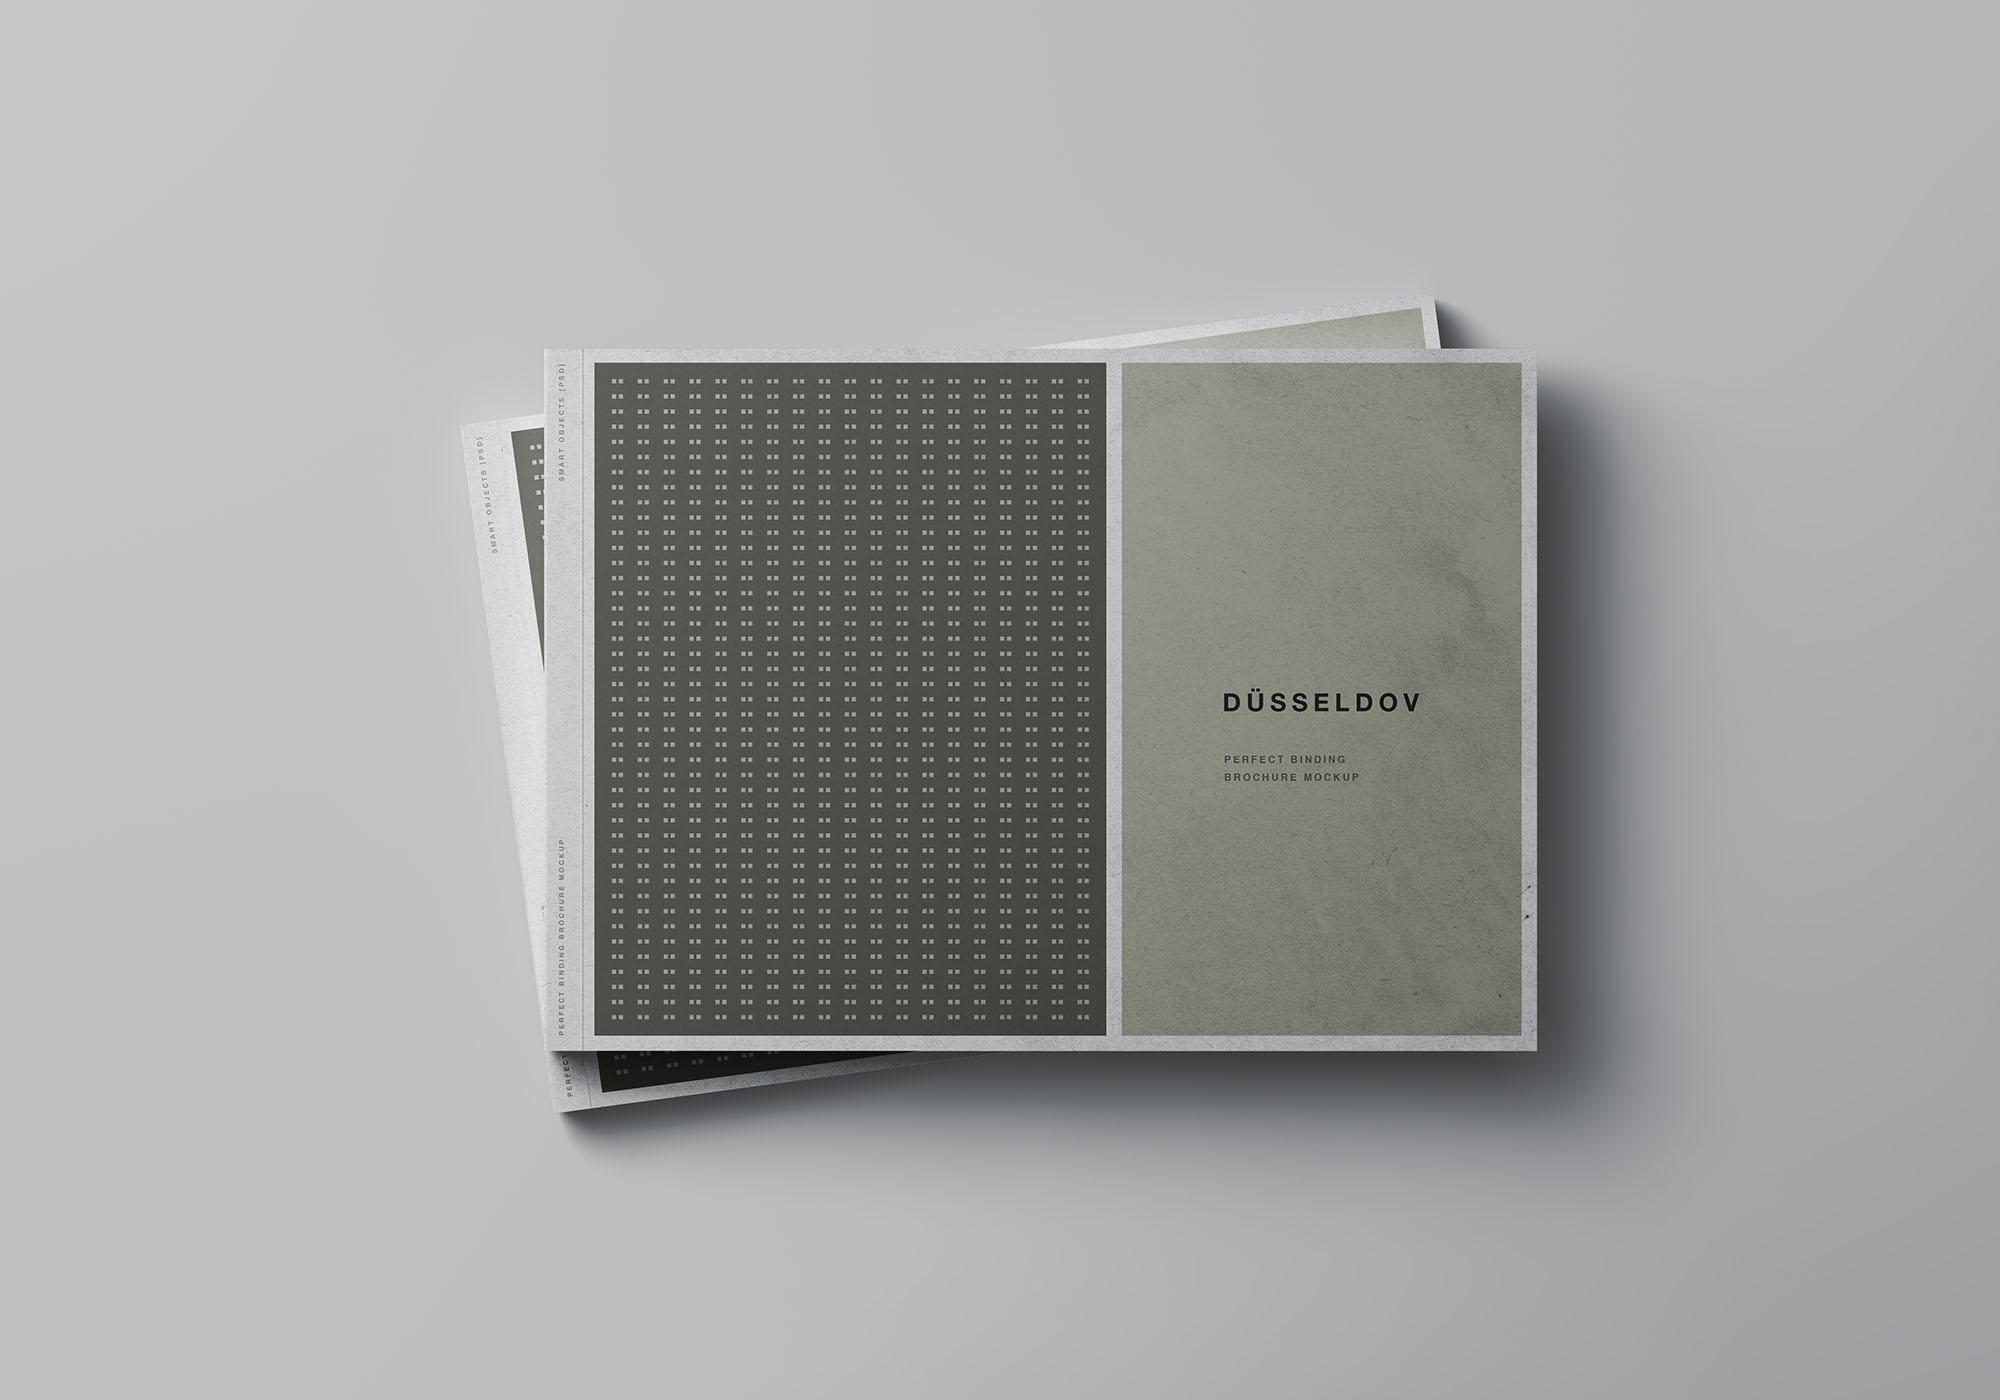 A4书籍画册杂志设计效果图样机模板 A4 Landscape Perfect Binding Brochure Mockup插图(4)